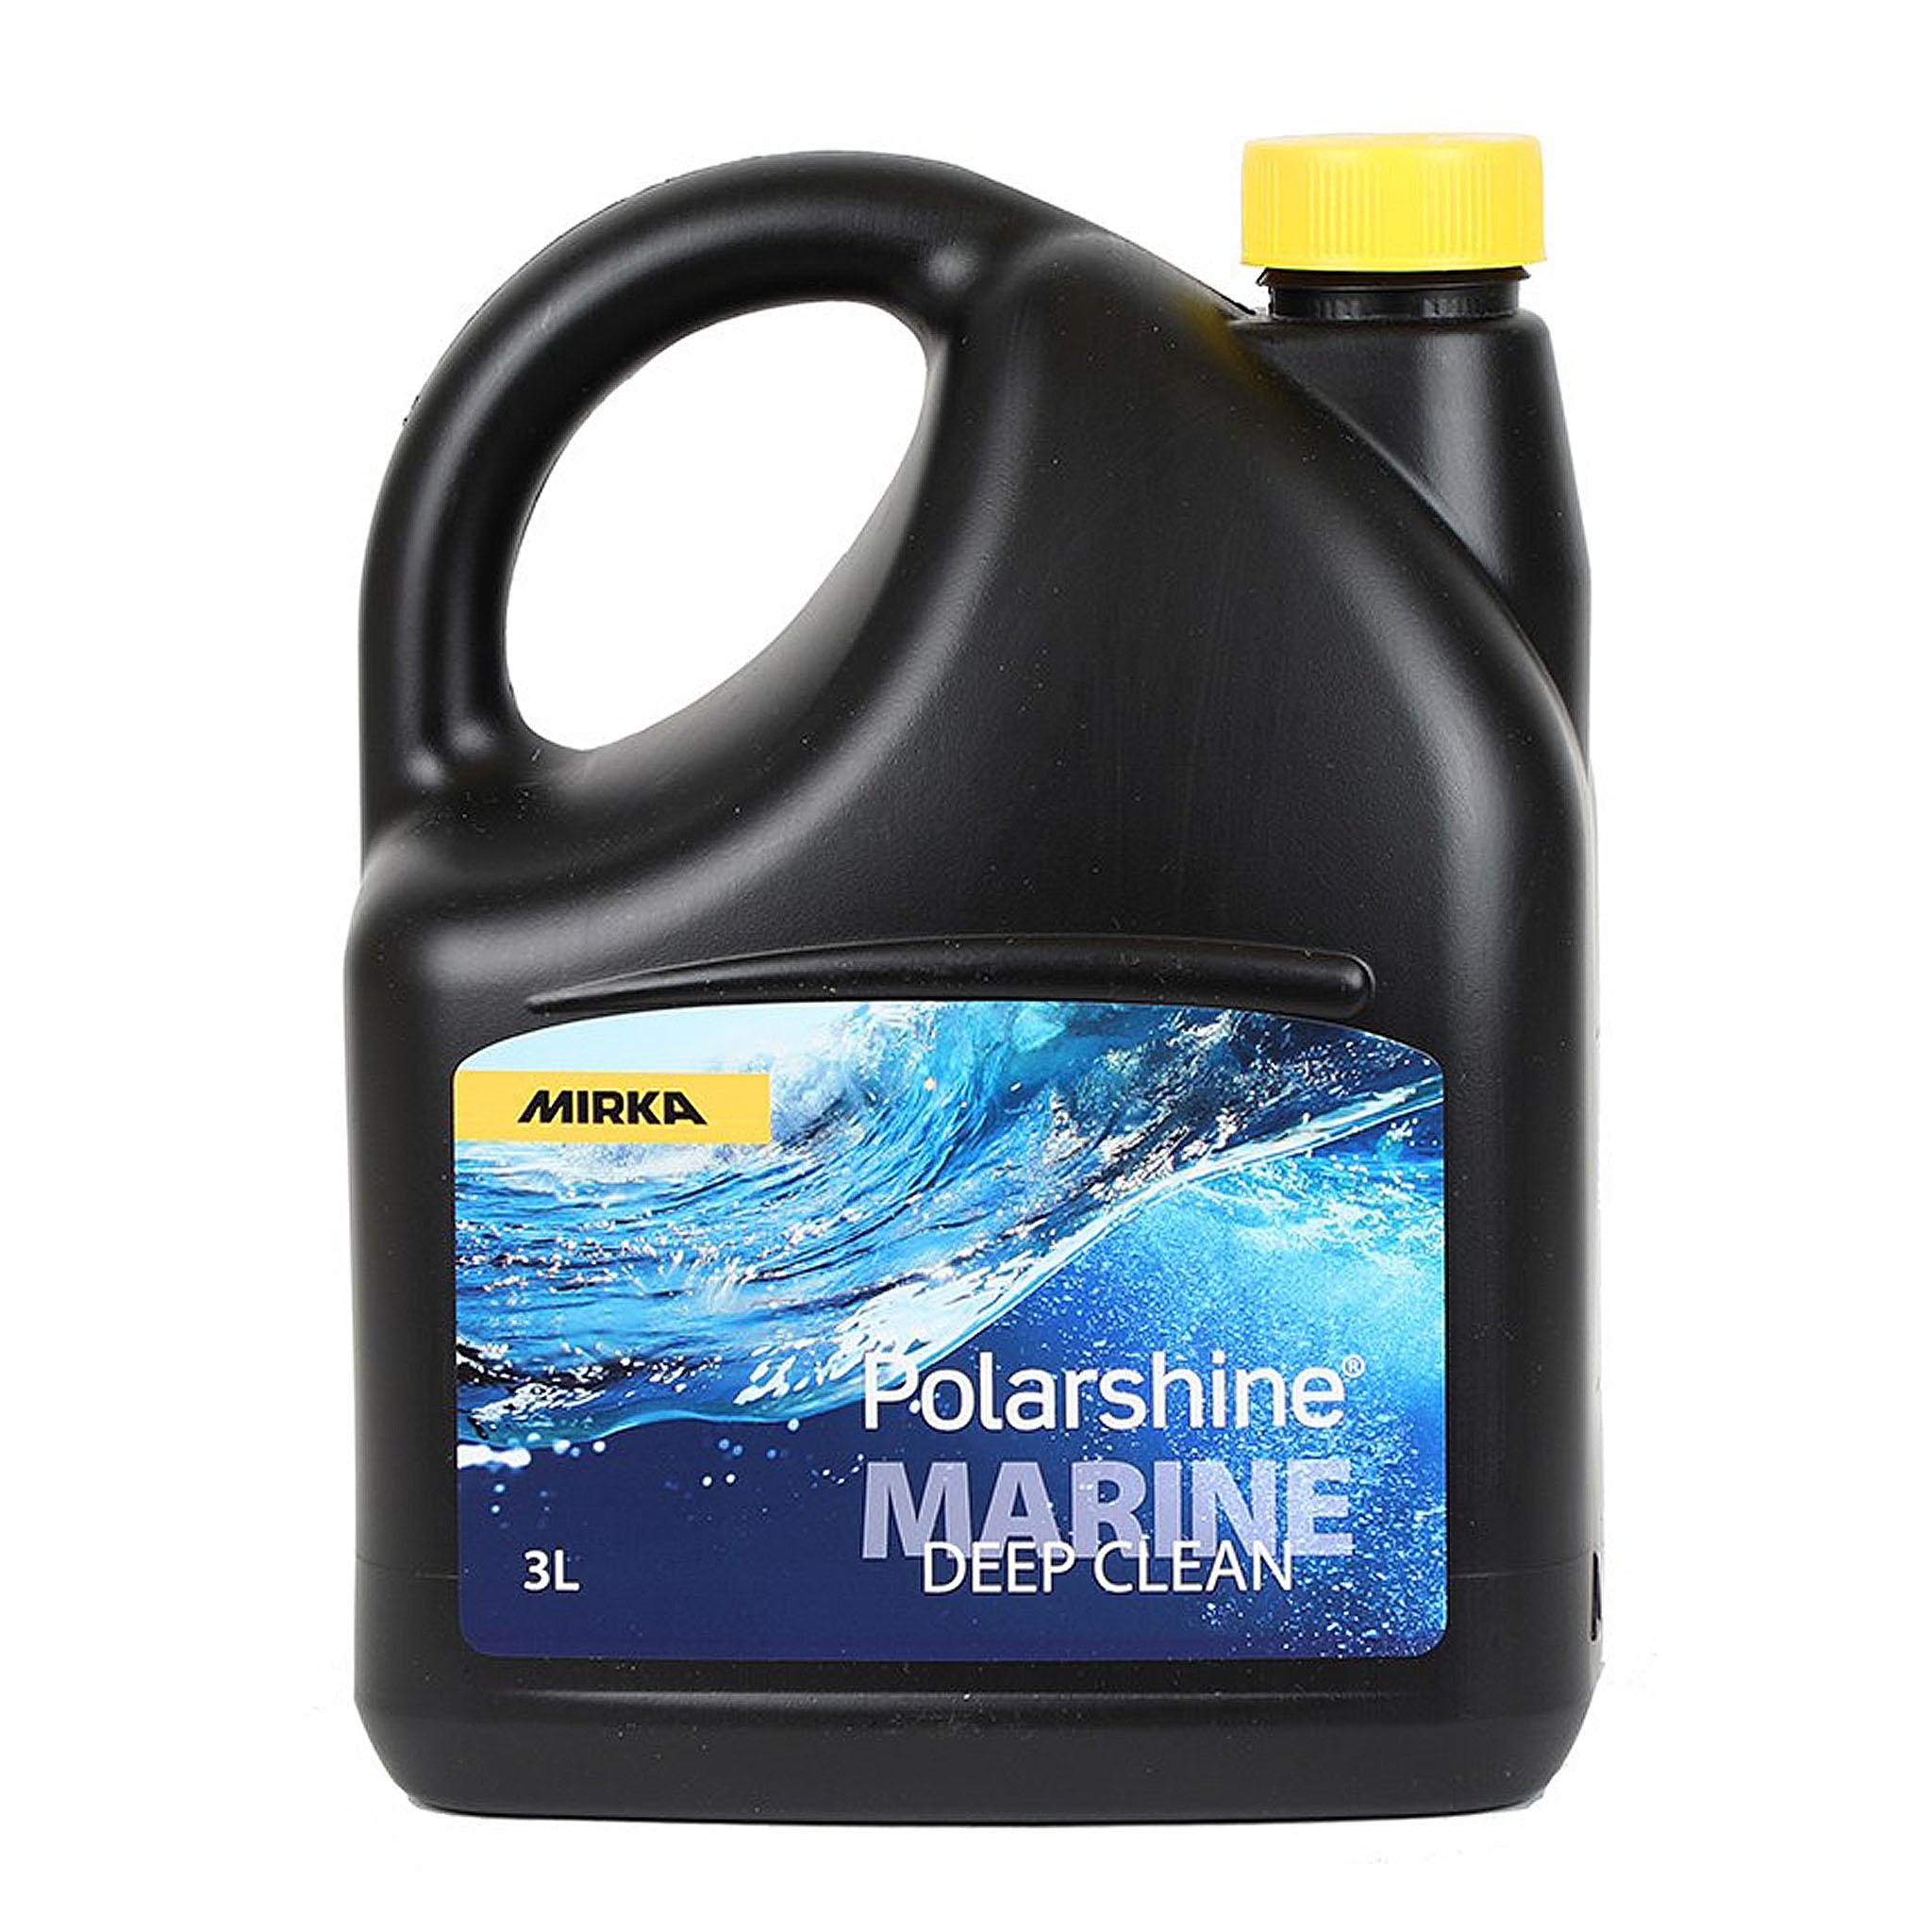 Båtrengöring Mirka Polarshine Marine Deep Clean, 3000 ml